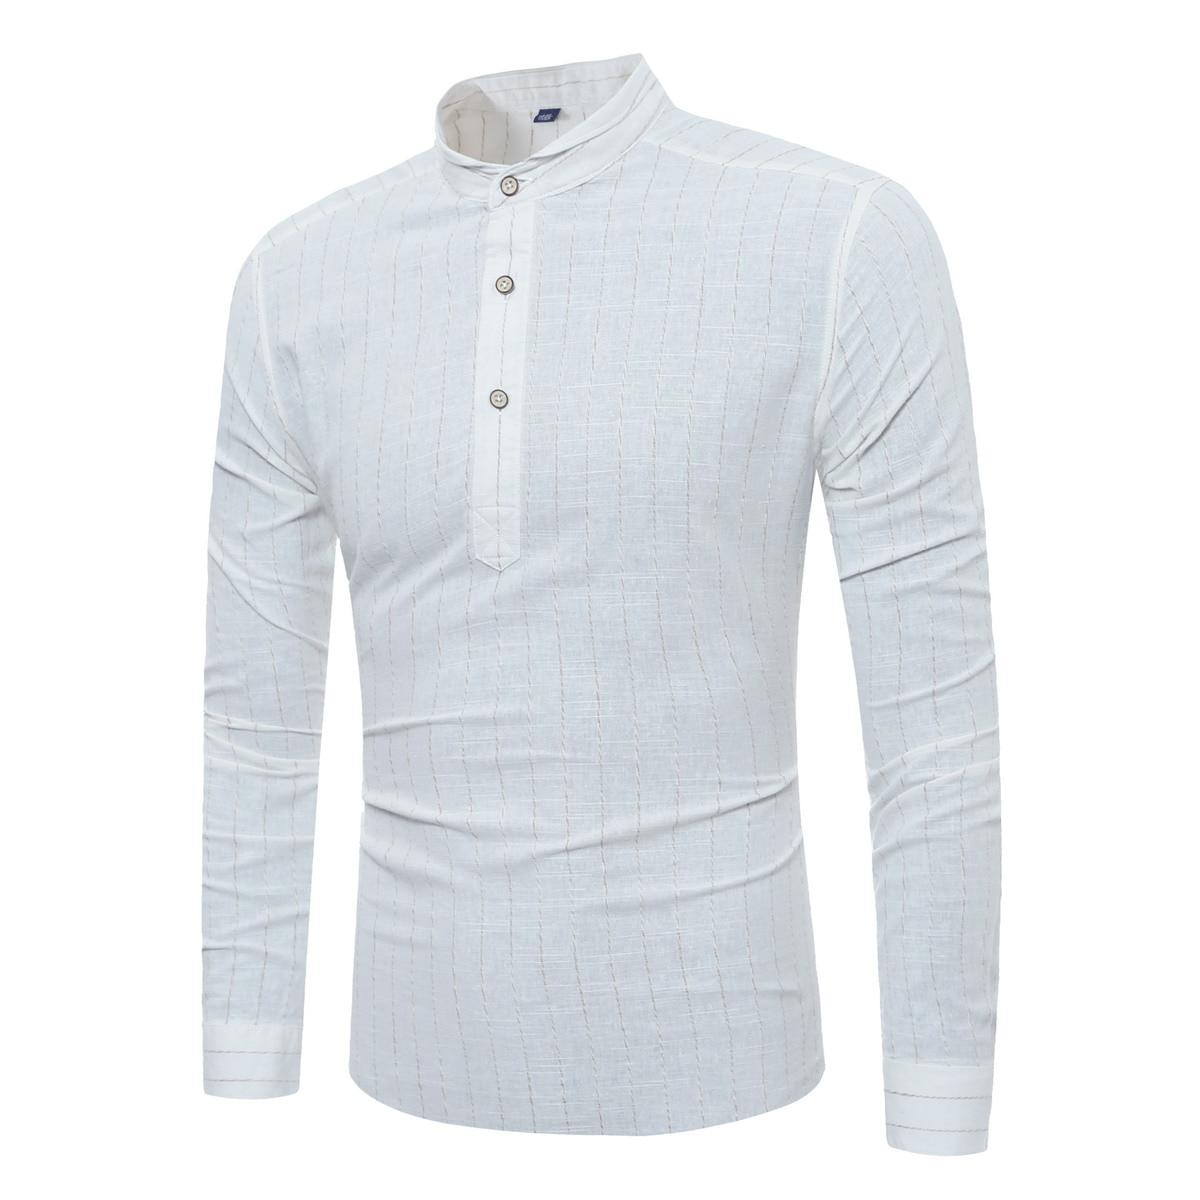 2017 new fashion font b men b font font b shirts b font solid stripe slim